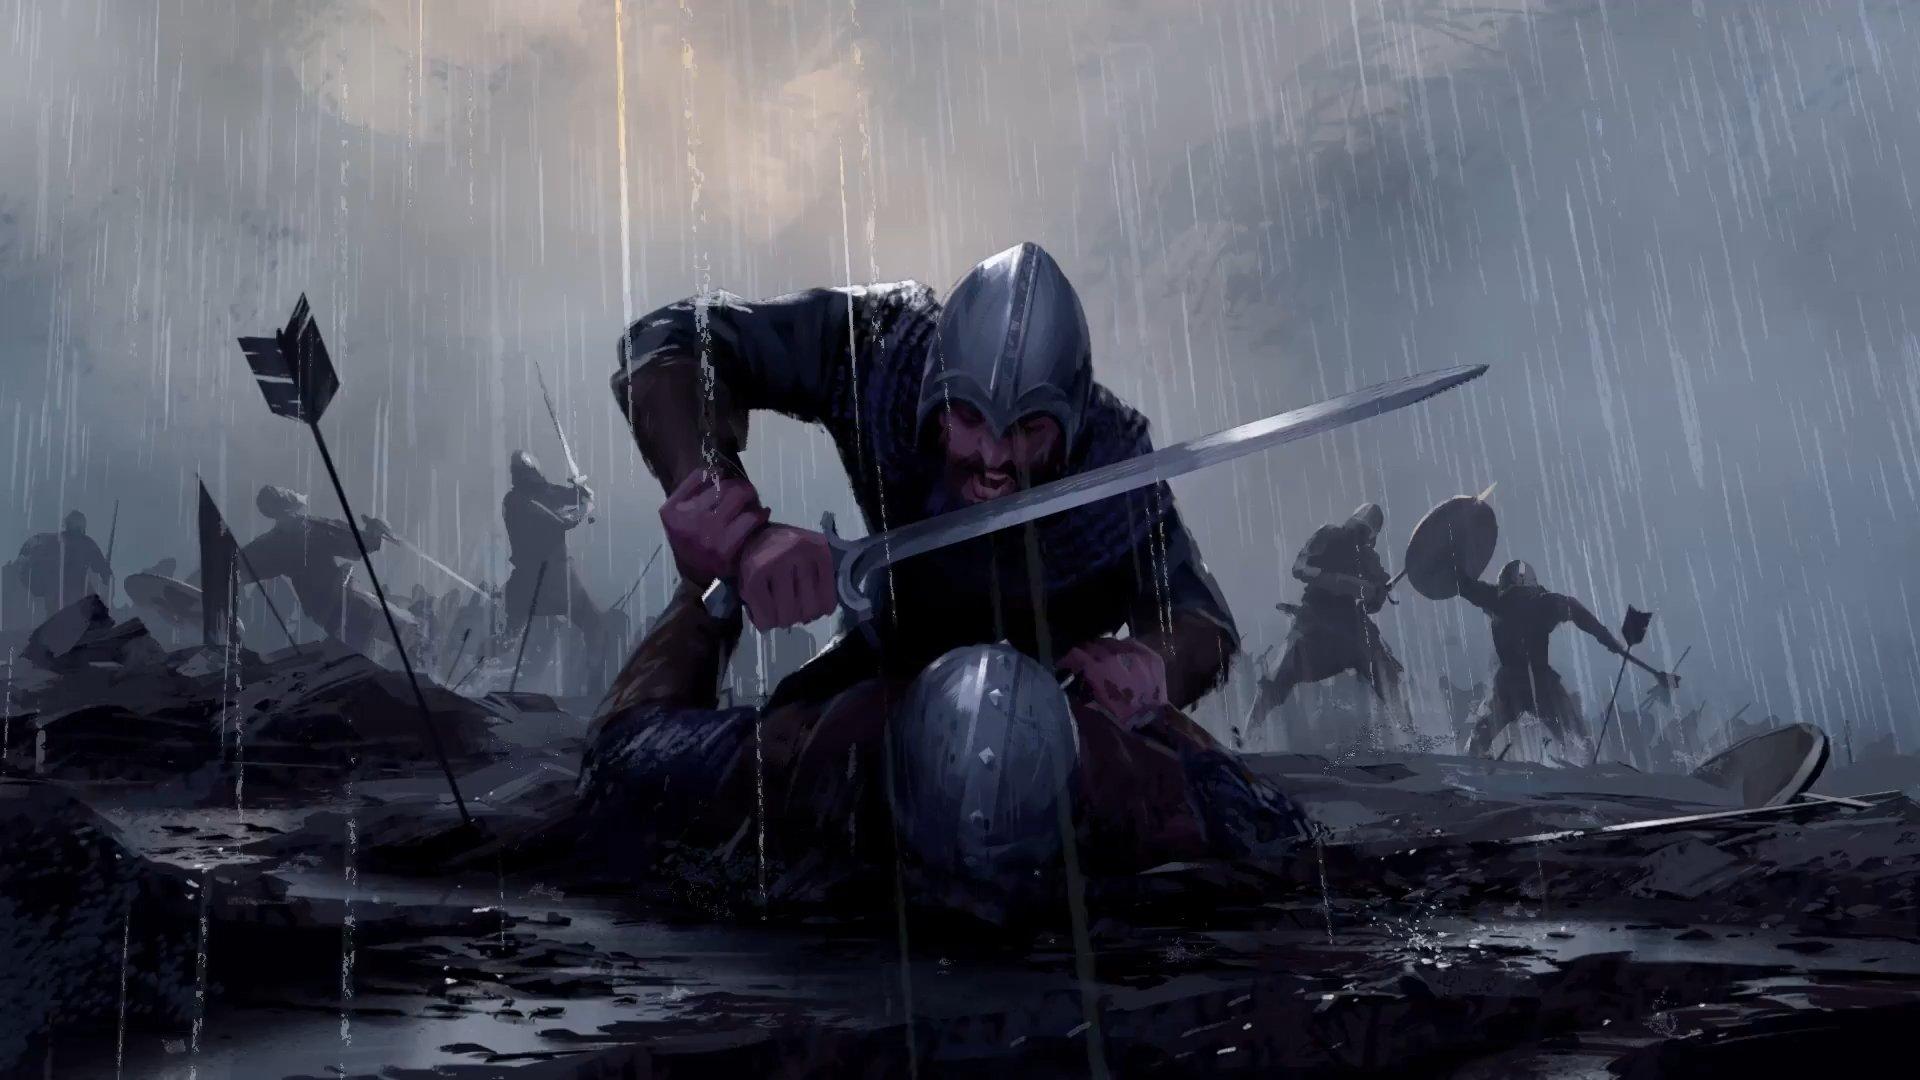 Total War Saga: Thrones of Britannia Oynanış Videosu, Sinematik Fragman.